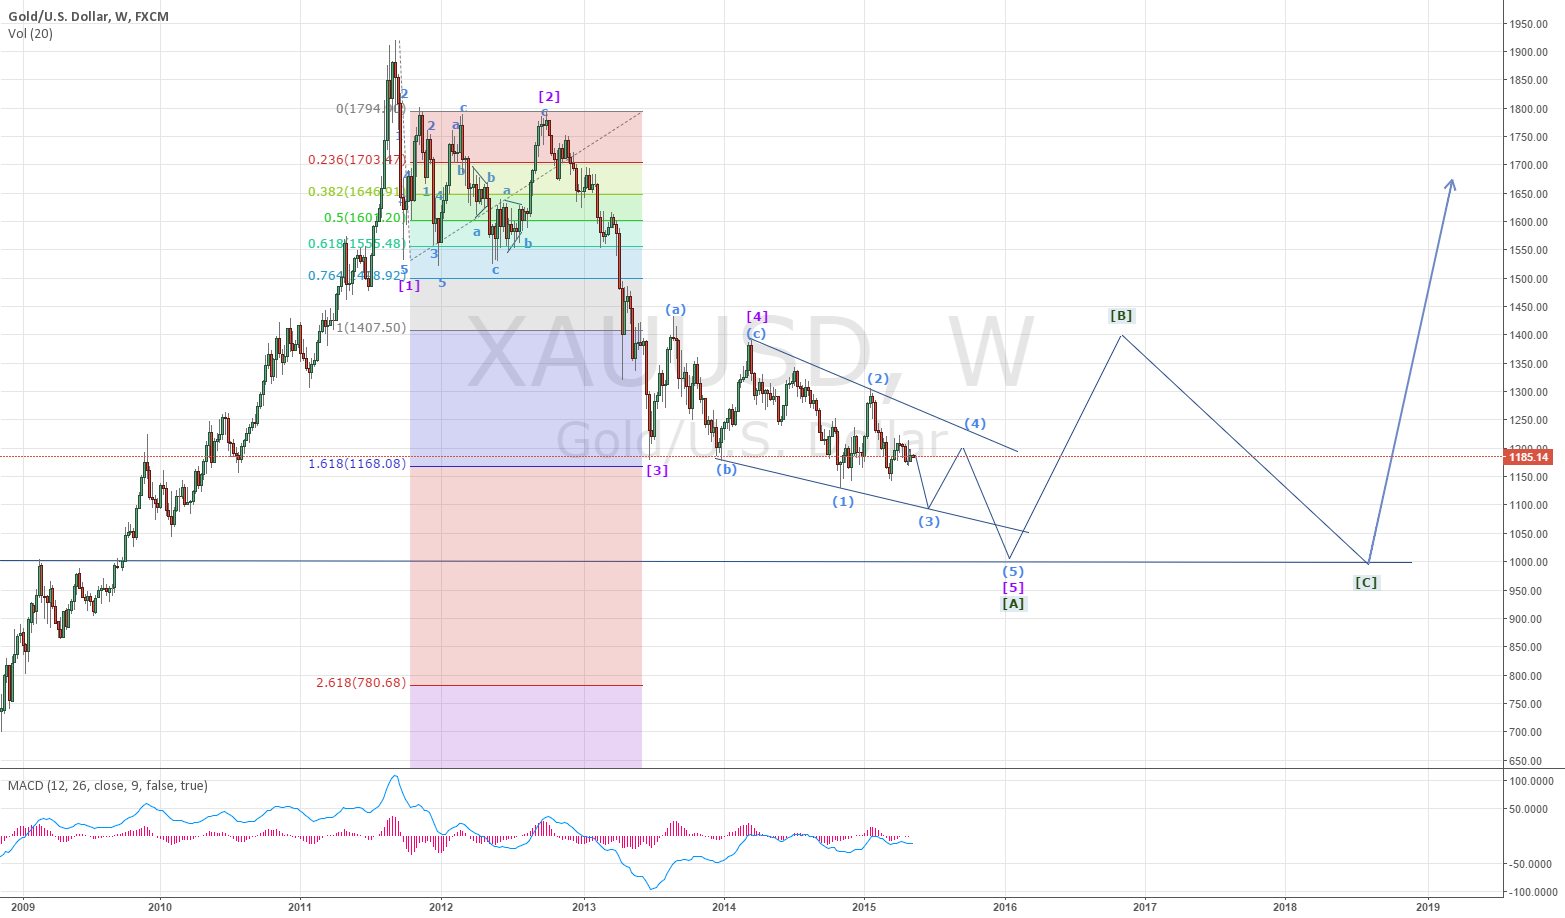 Gold EW analysis. Correction is just half-way through.